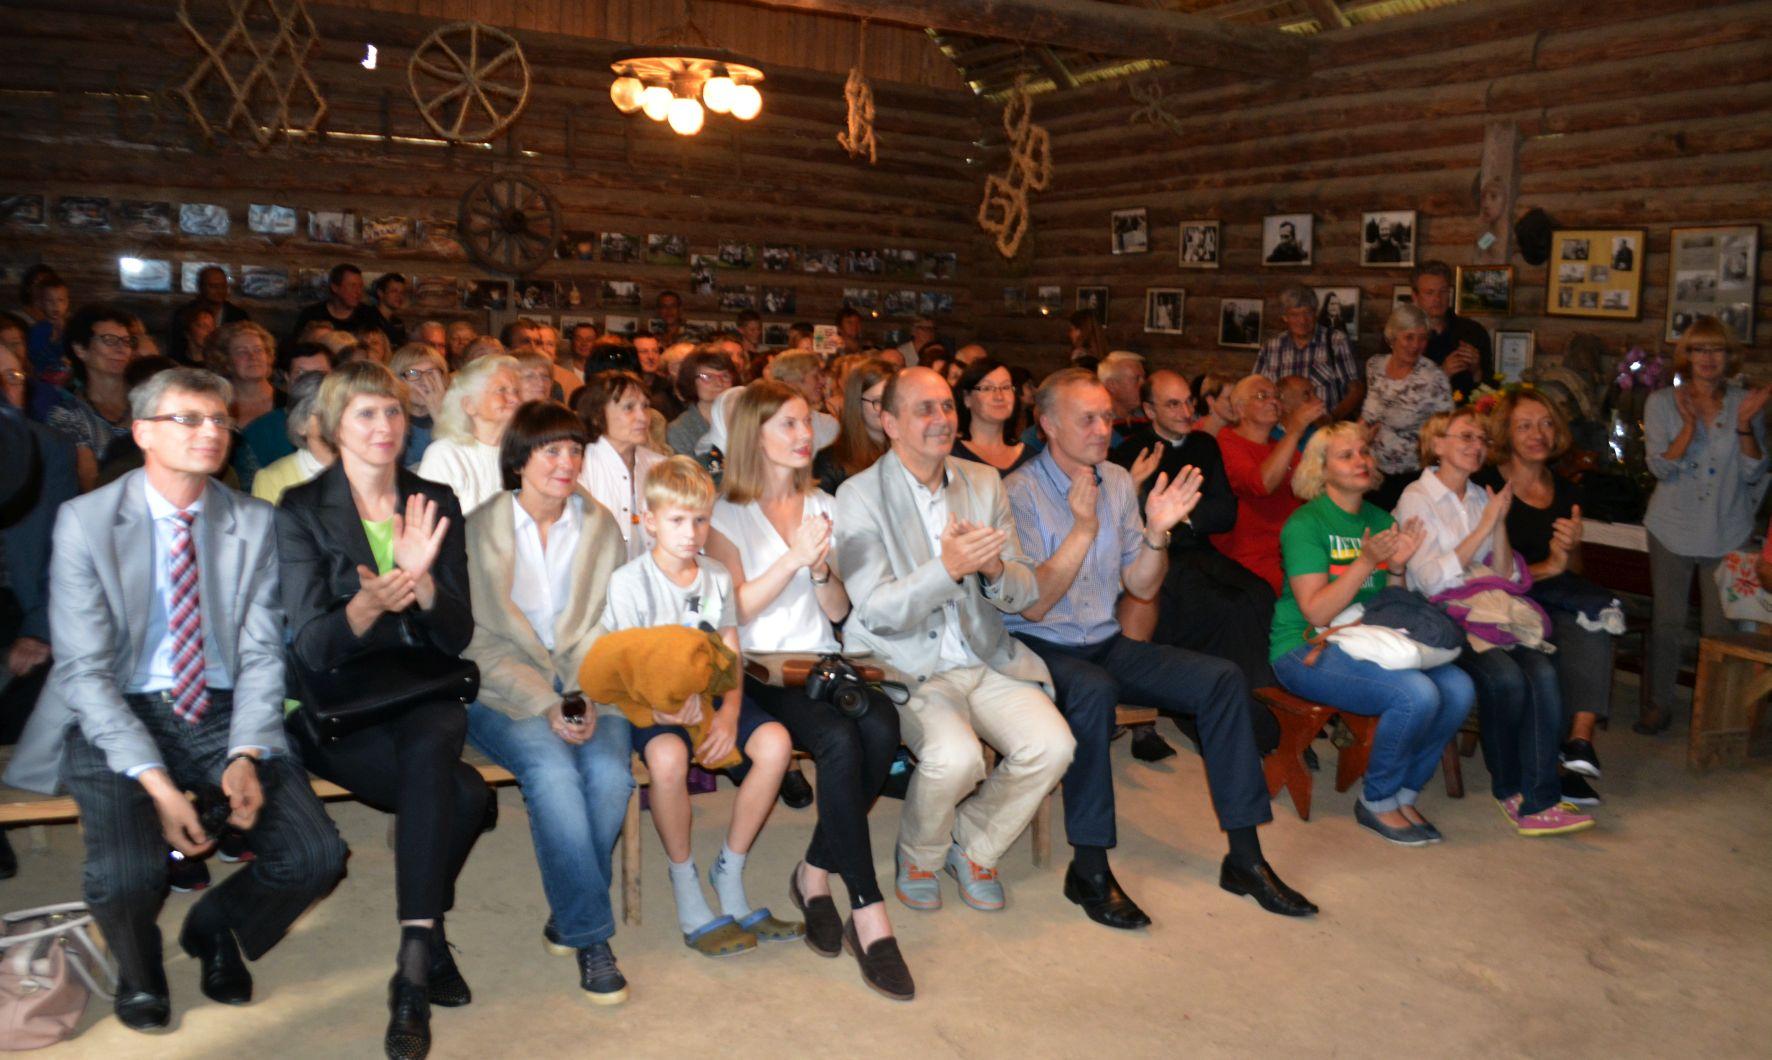 Margioniu-klojimo-teatras-ziurovai-rengeju nuotr.